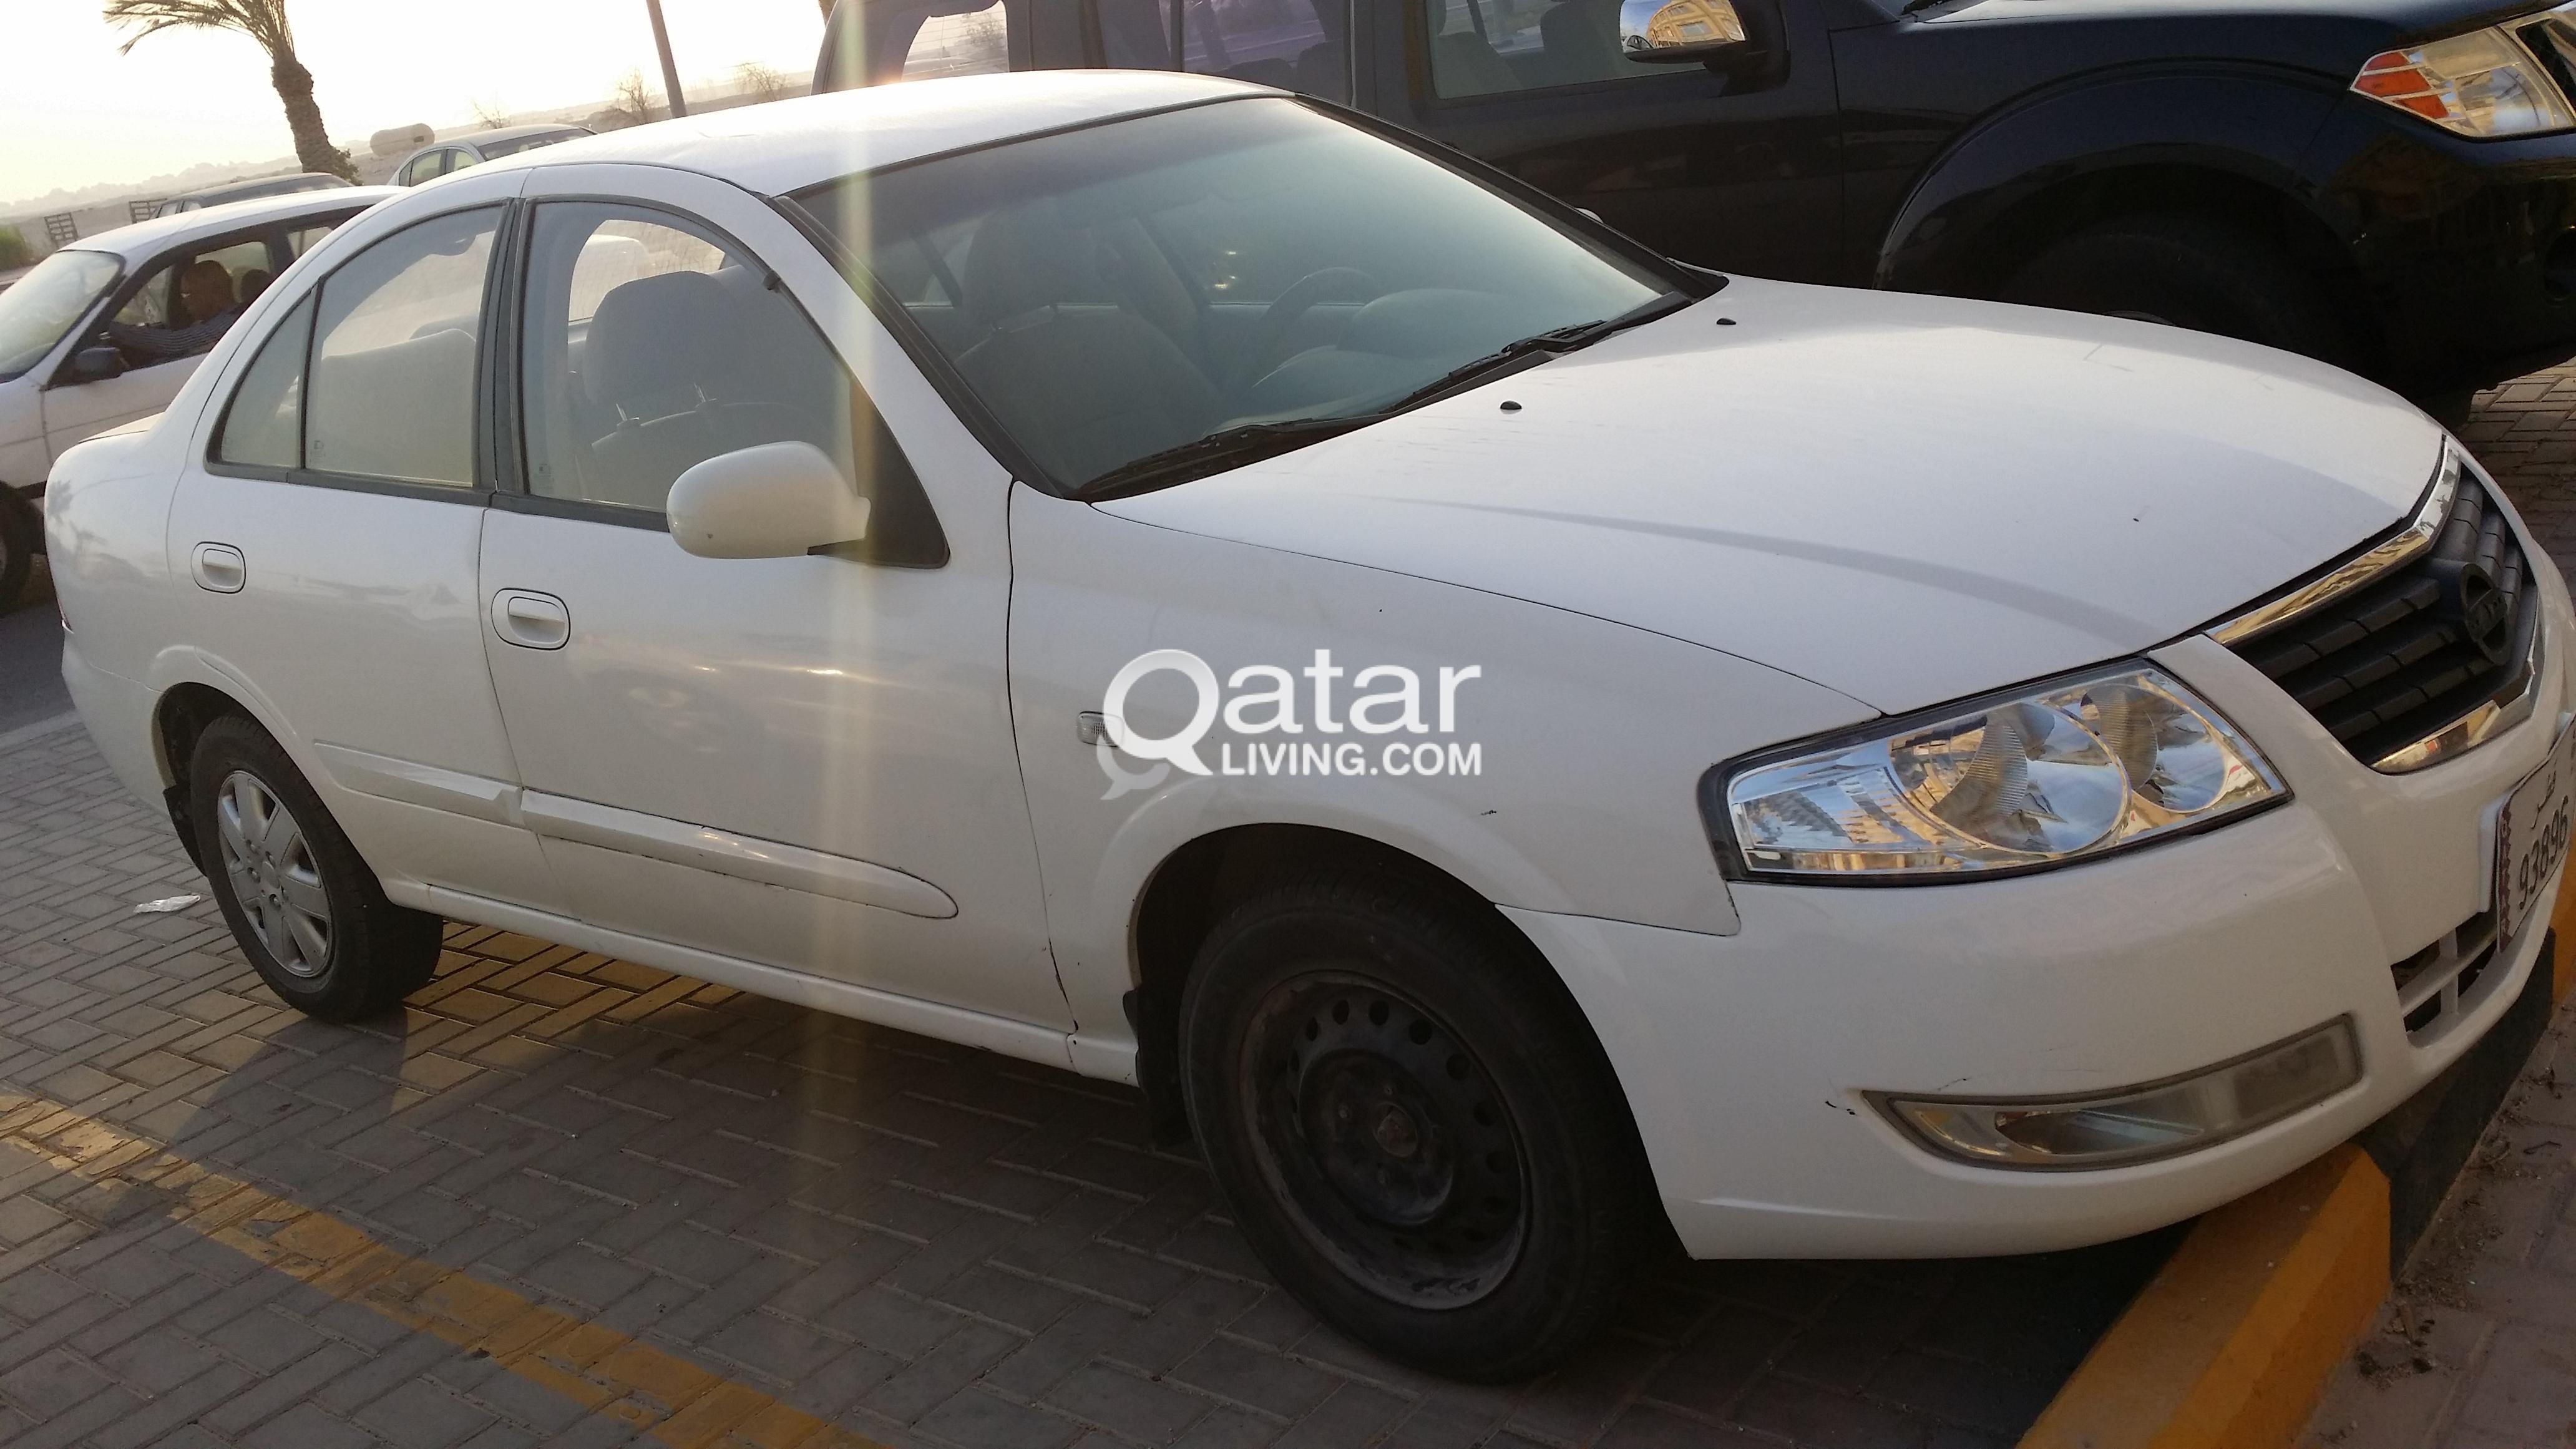 Nissan Sunny Japan Made For Immediate Sale Qatar Living